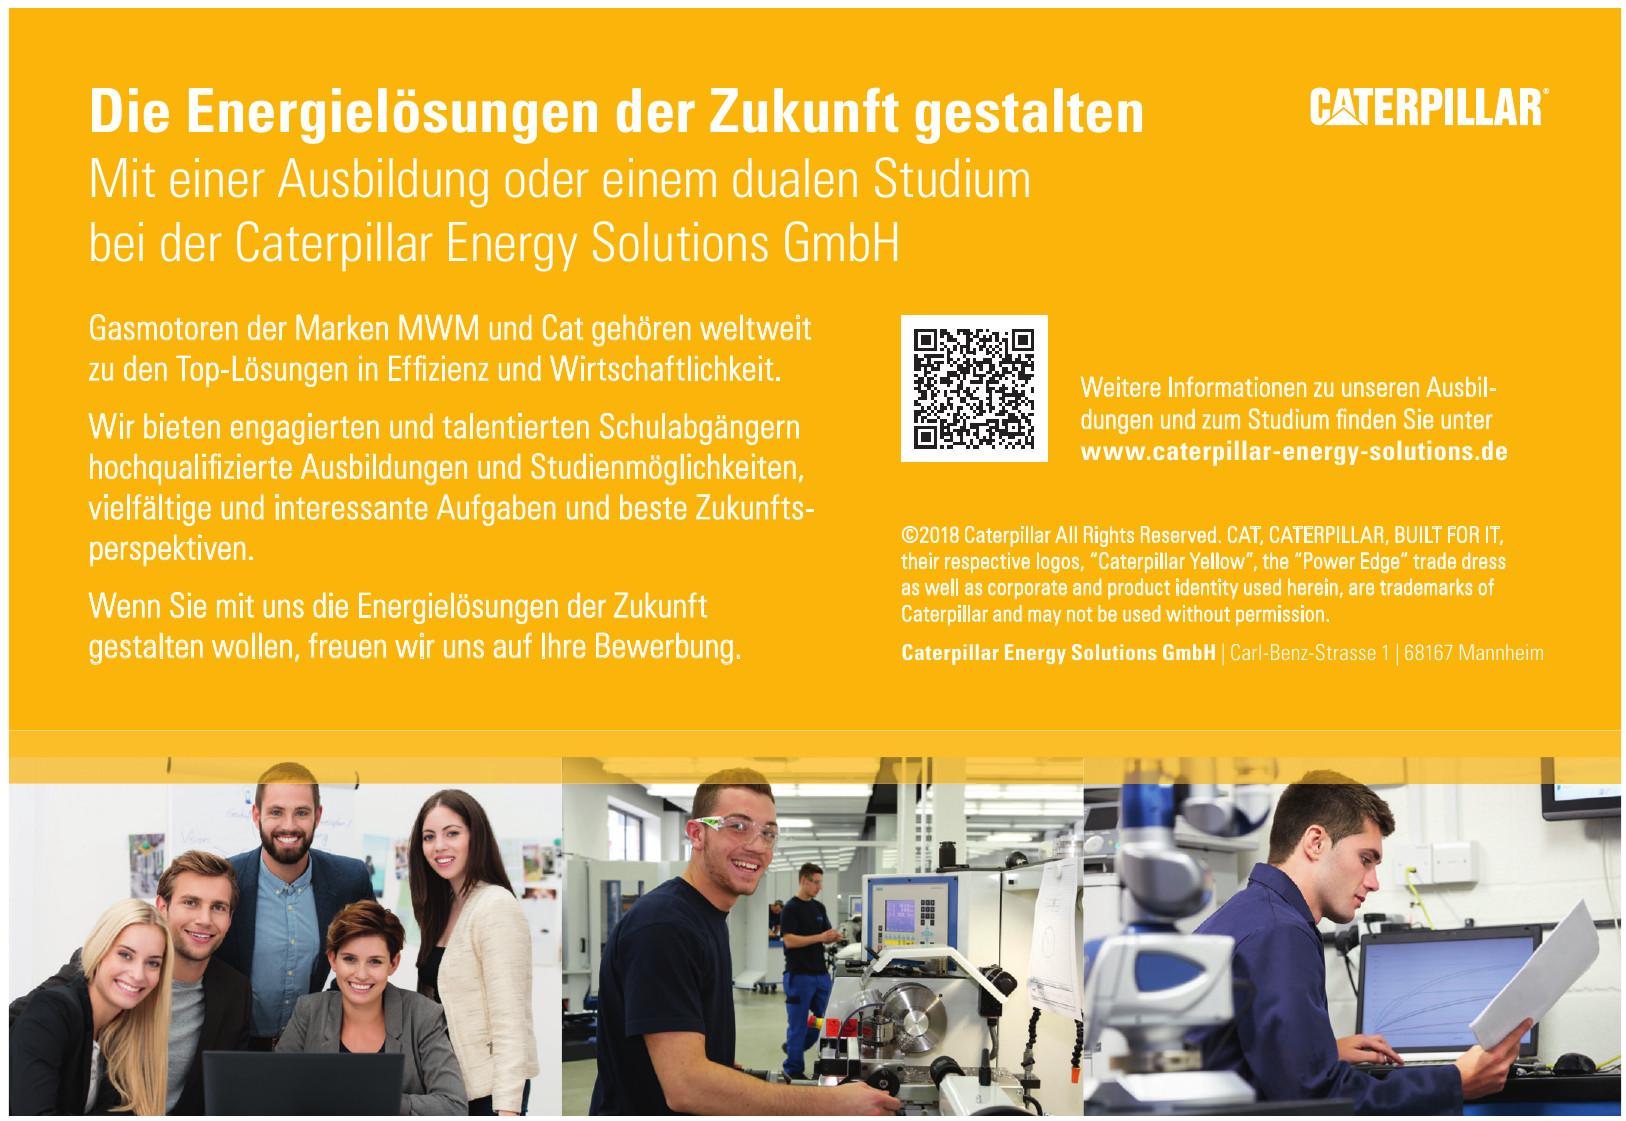 Caterpillar Energy Solutions GmbH